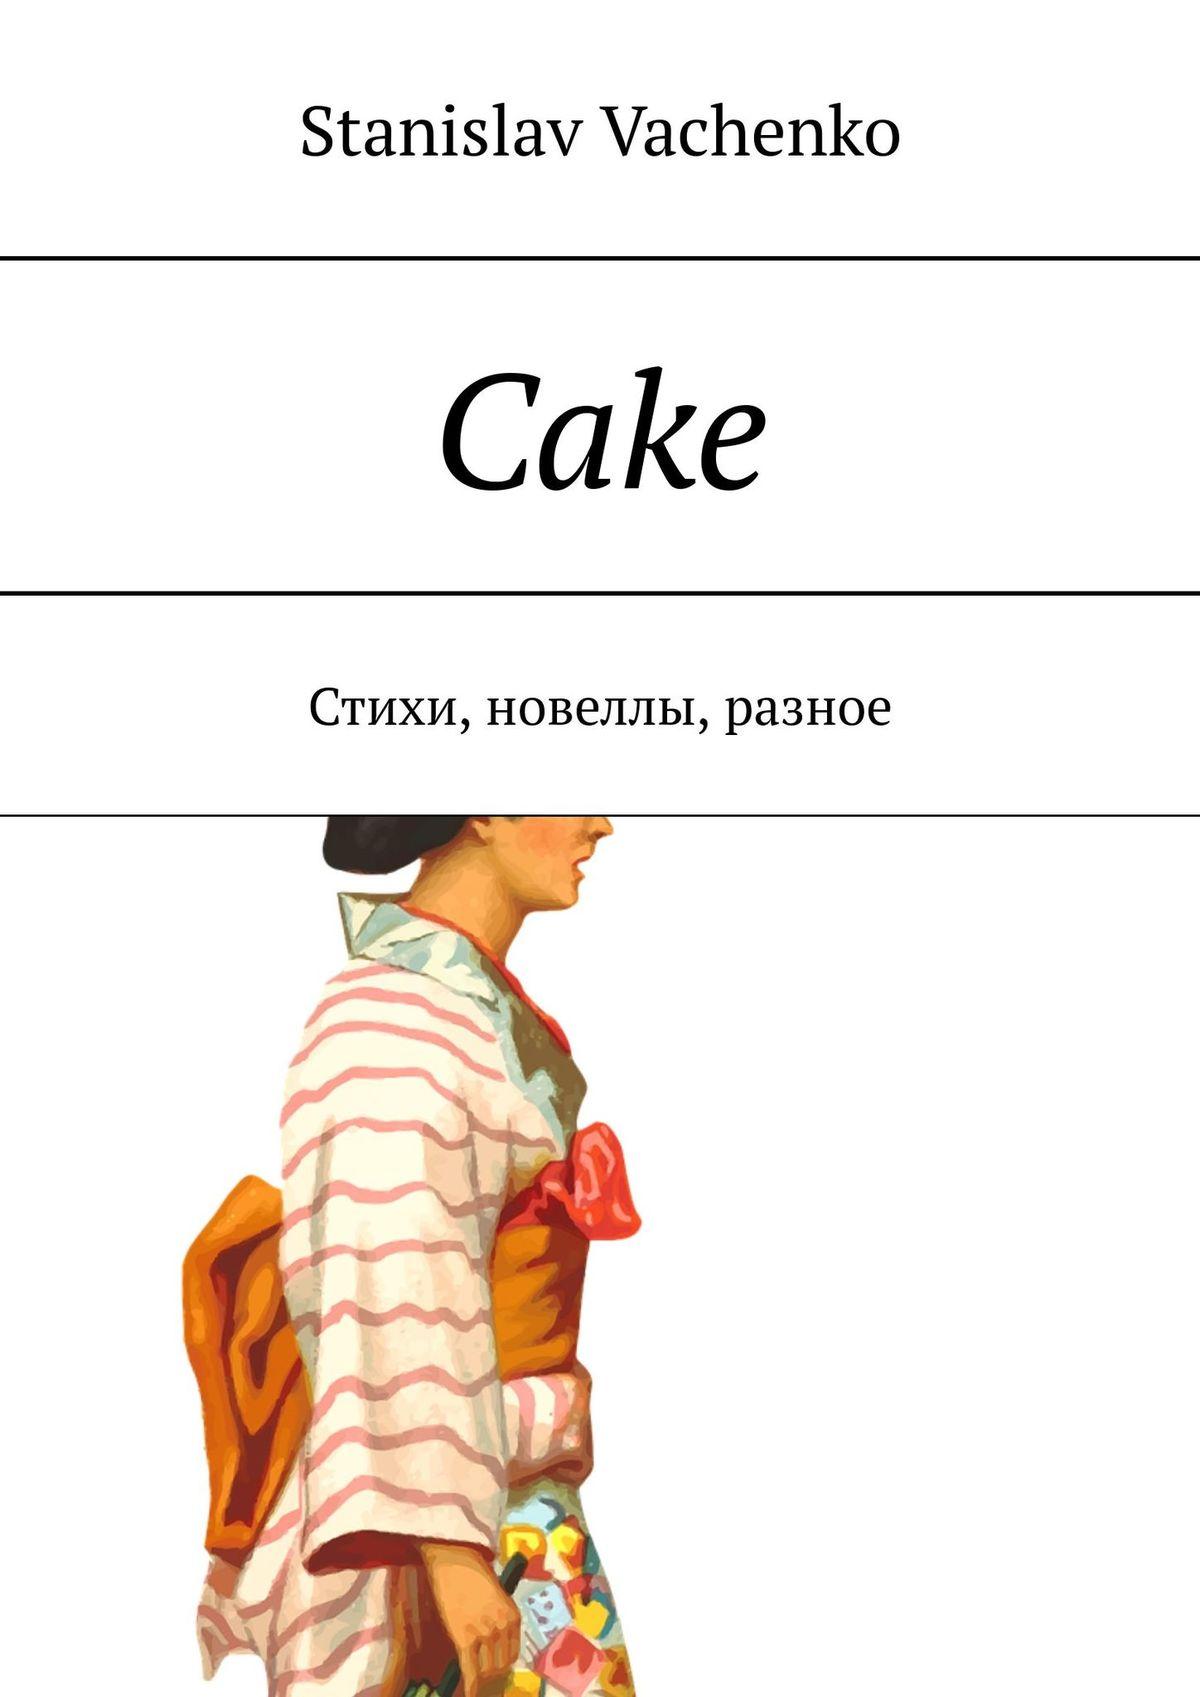 Stanislav Vachenko Cake. Стихи, новеллы, разное